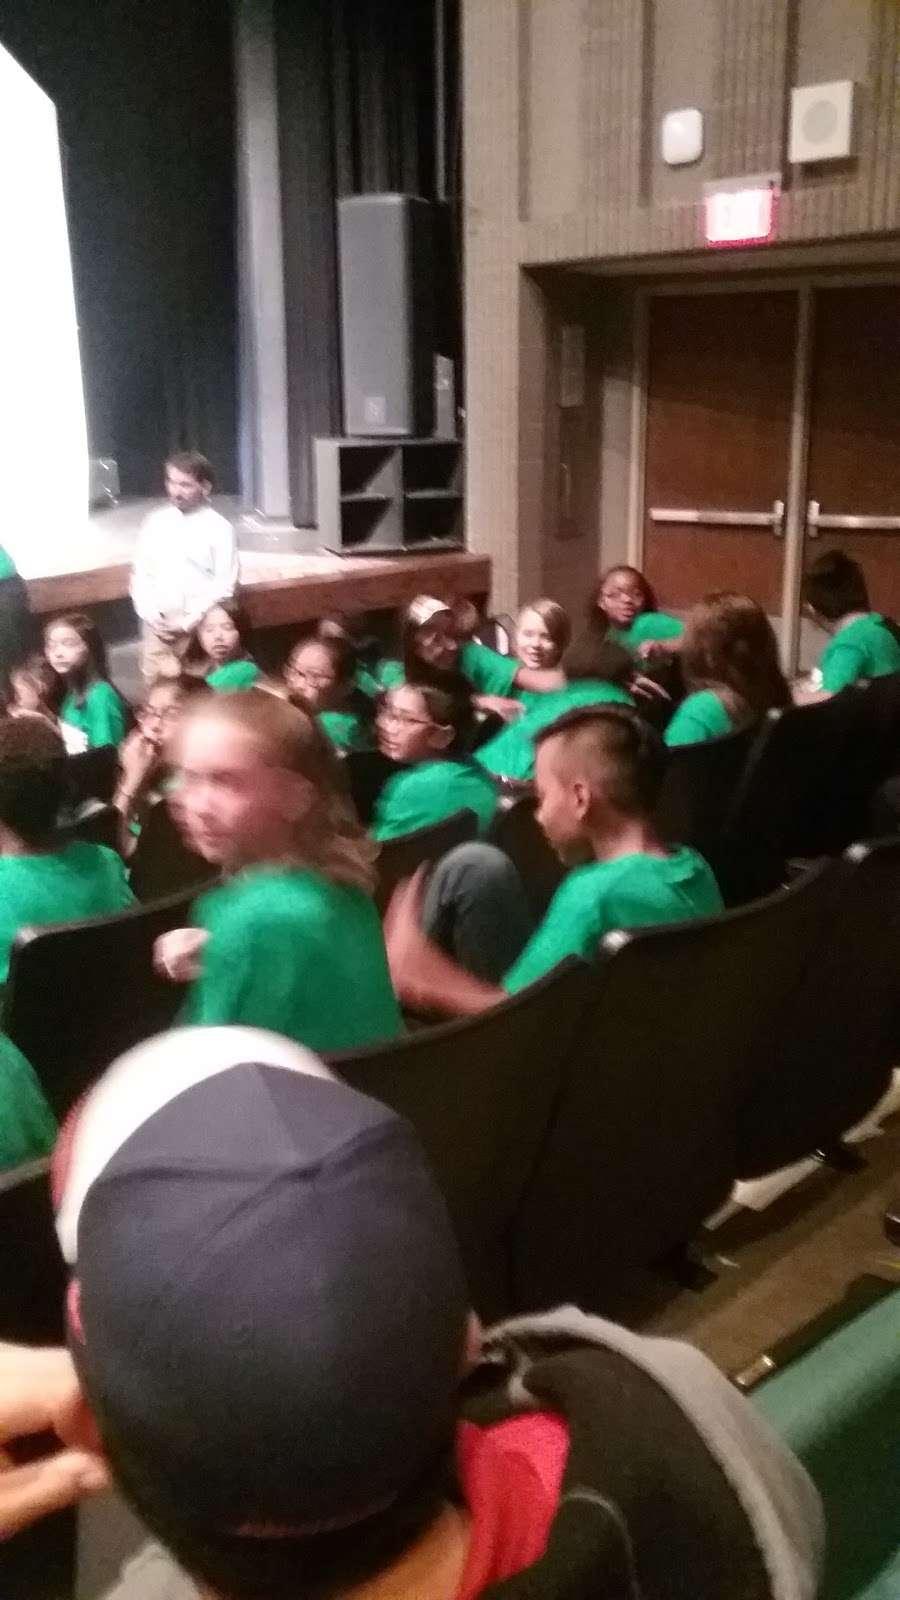 Prairie Middle School - school  | Photo 5 of 6 | Address: 12600 E Jewell Ave, Aurora, CO 80012, USA | Phone: (720) 747-3000